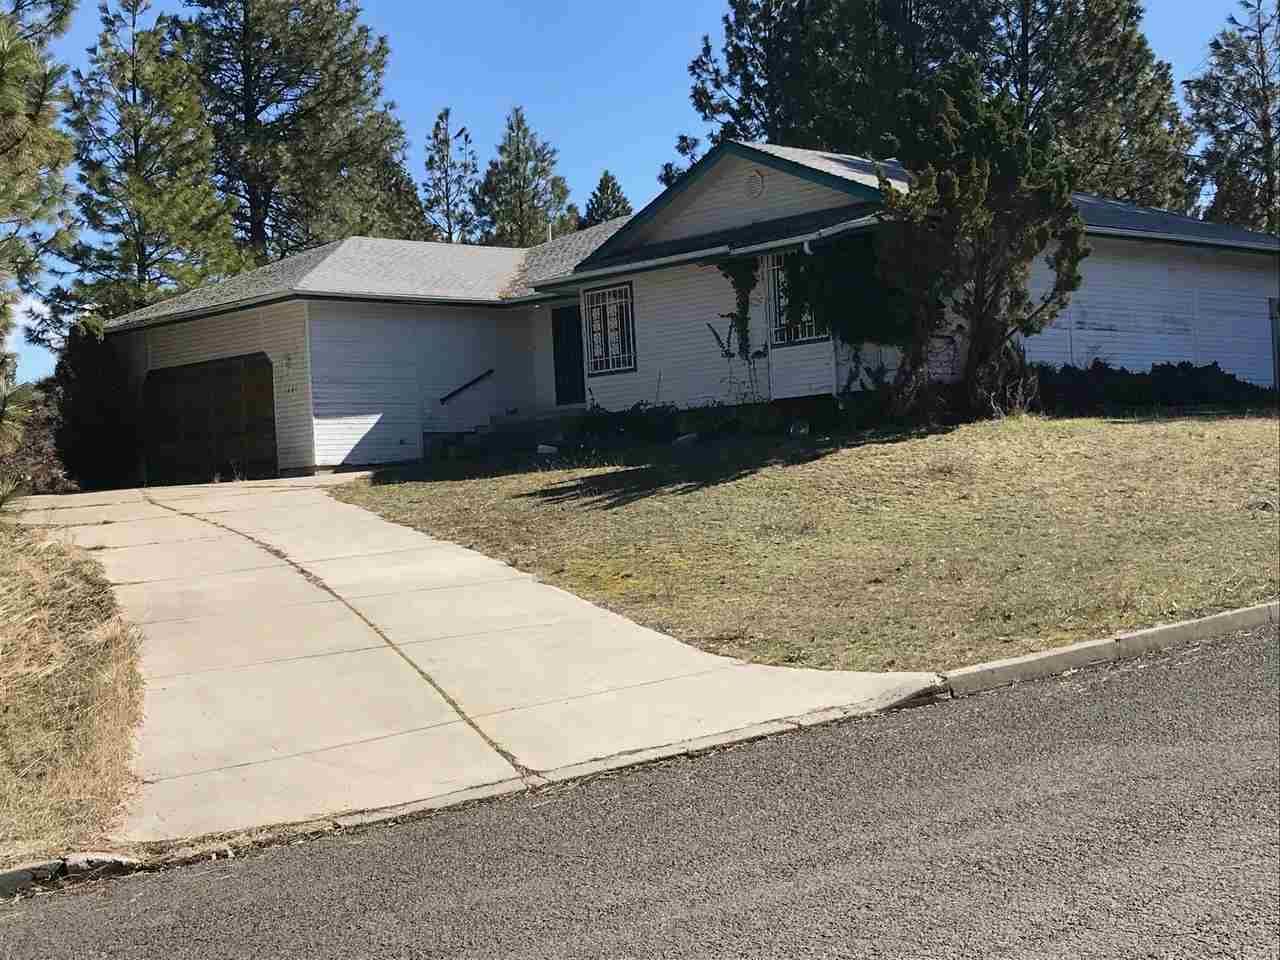 1401 S Howe St, Spokane, WA - USA (photo 1)